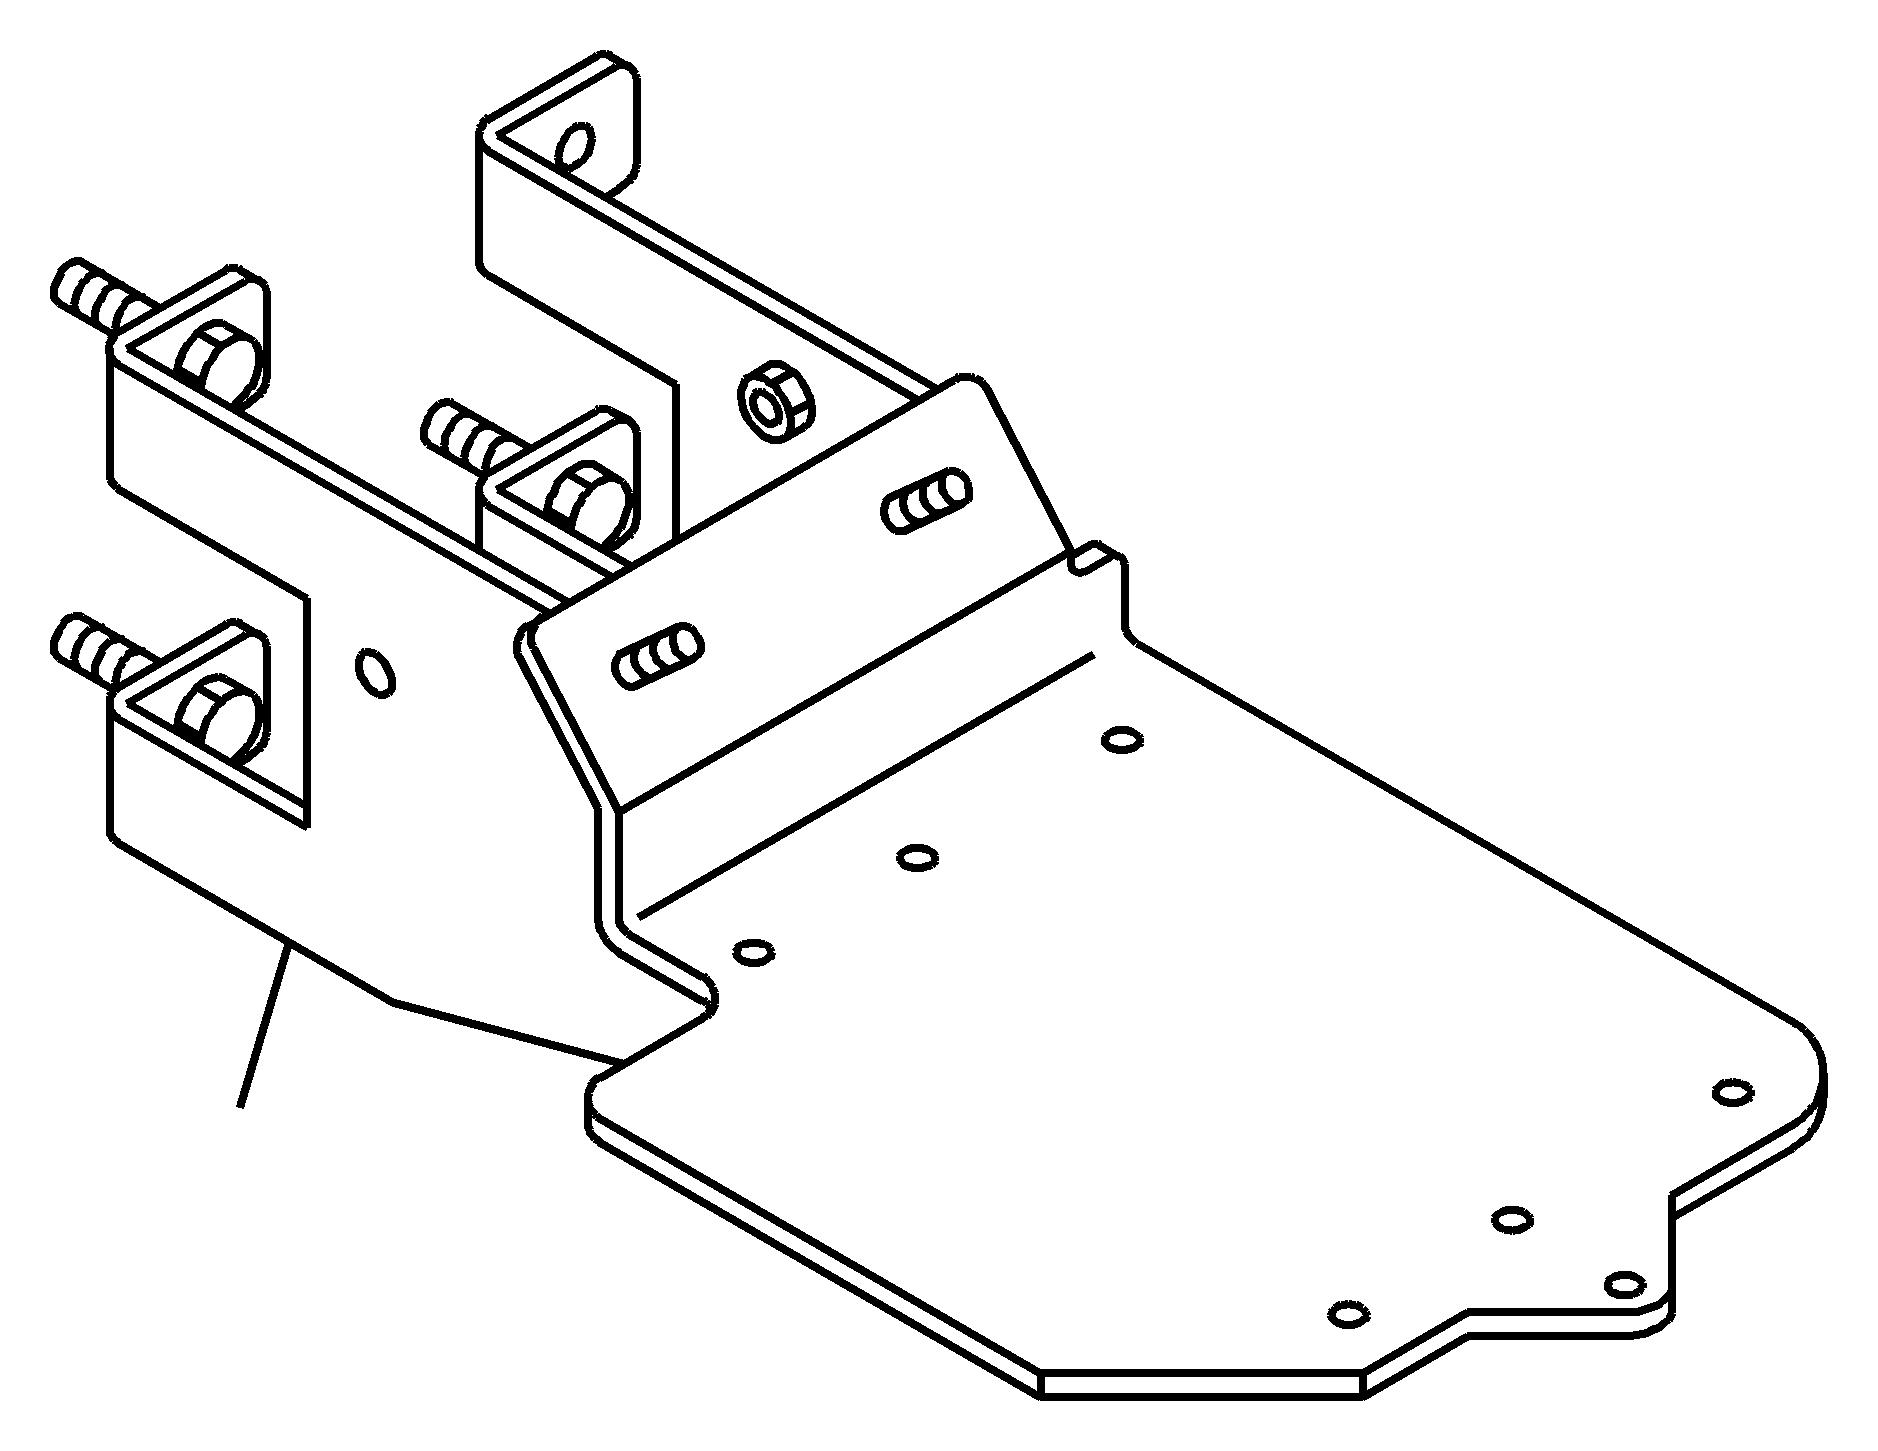 [DIAGRAM] Isuzu Nqr Engine Diagram FULL Version HD Quality